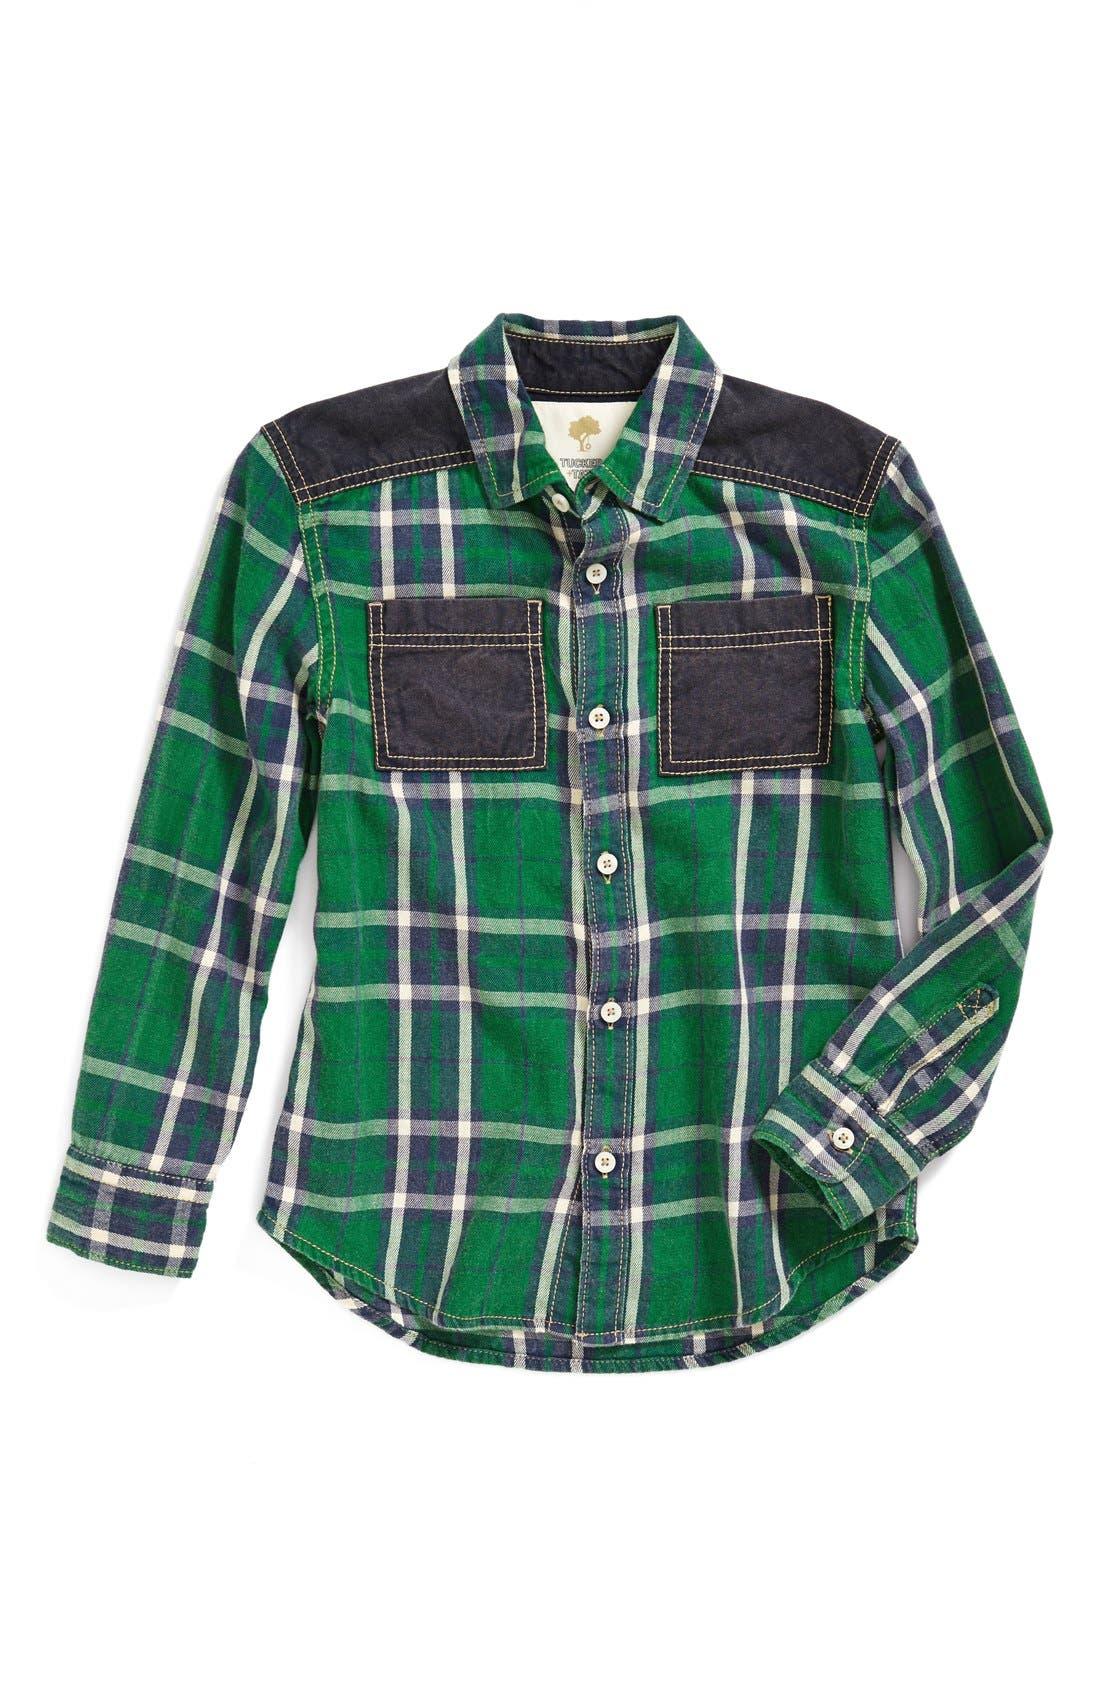 Alternate Image 1 Selected - Tucker + Tate 'Lenny' Contrast Trim Long Sleeve Shirt (Toddler Boys & Little Boys)